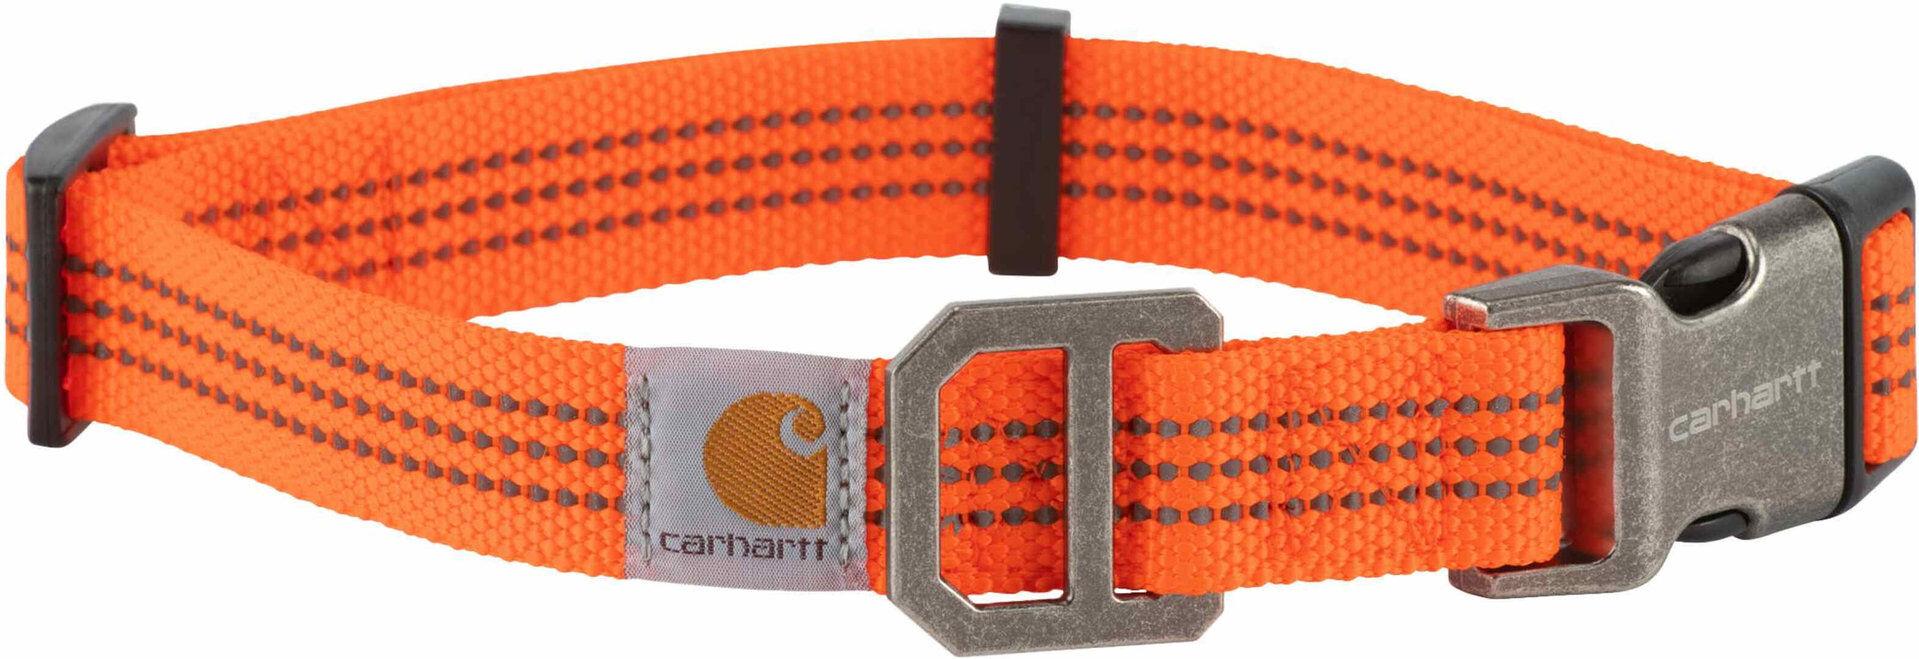 Carhartt Tradesman Hundehalsband Orange M